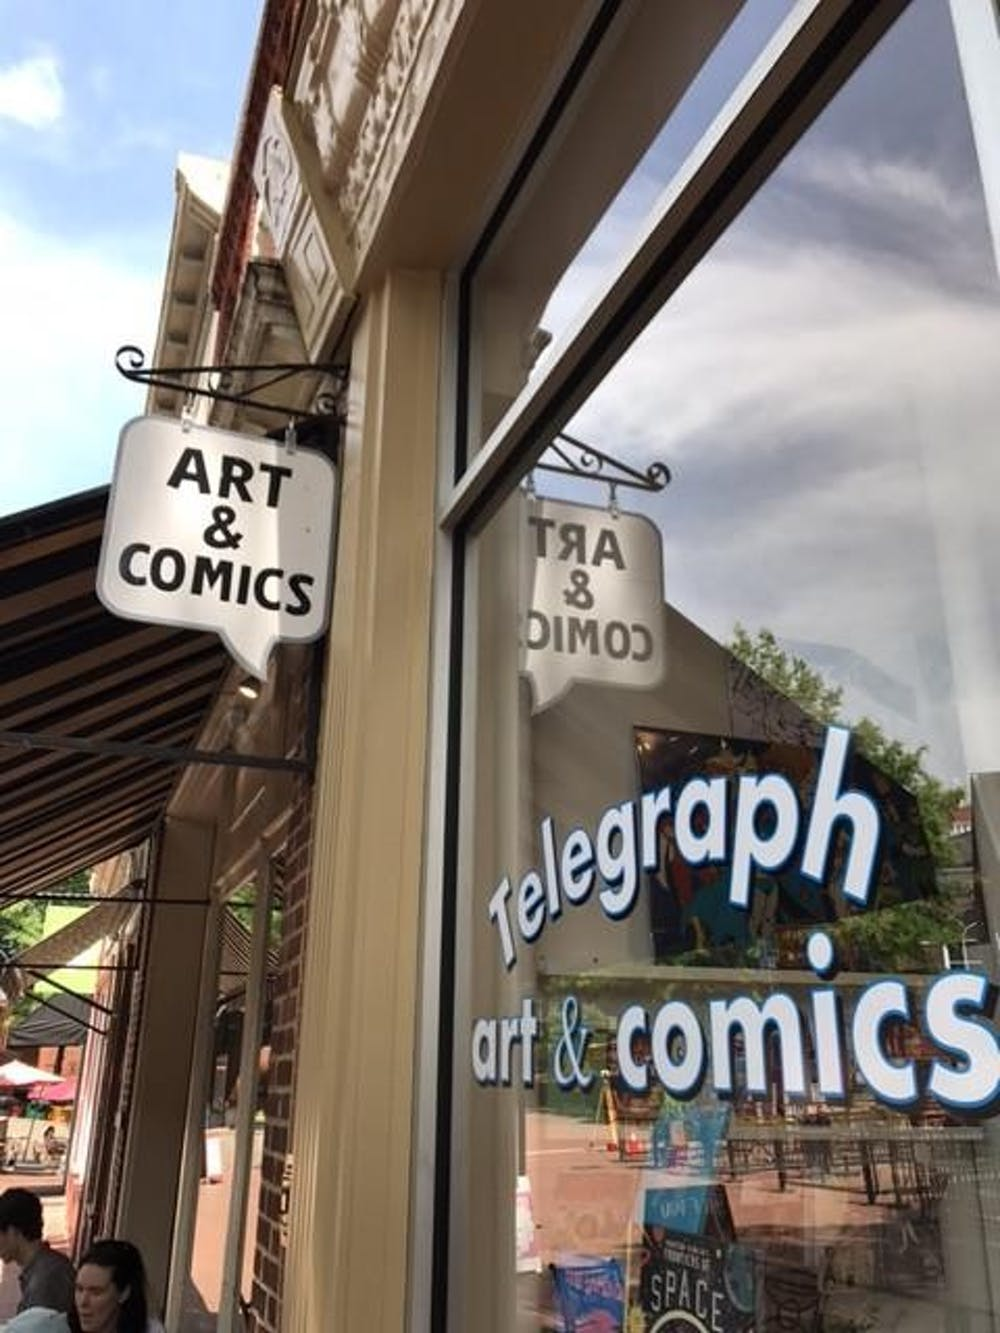 ae-telegraphartandcomics-courtesy-telegraph-art-and-comics